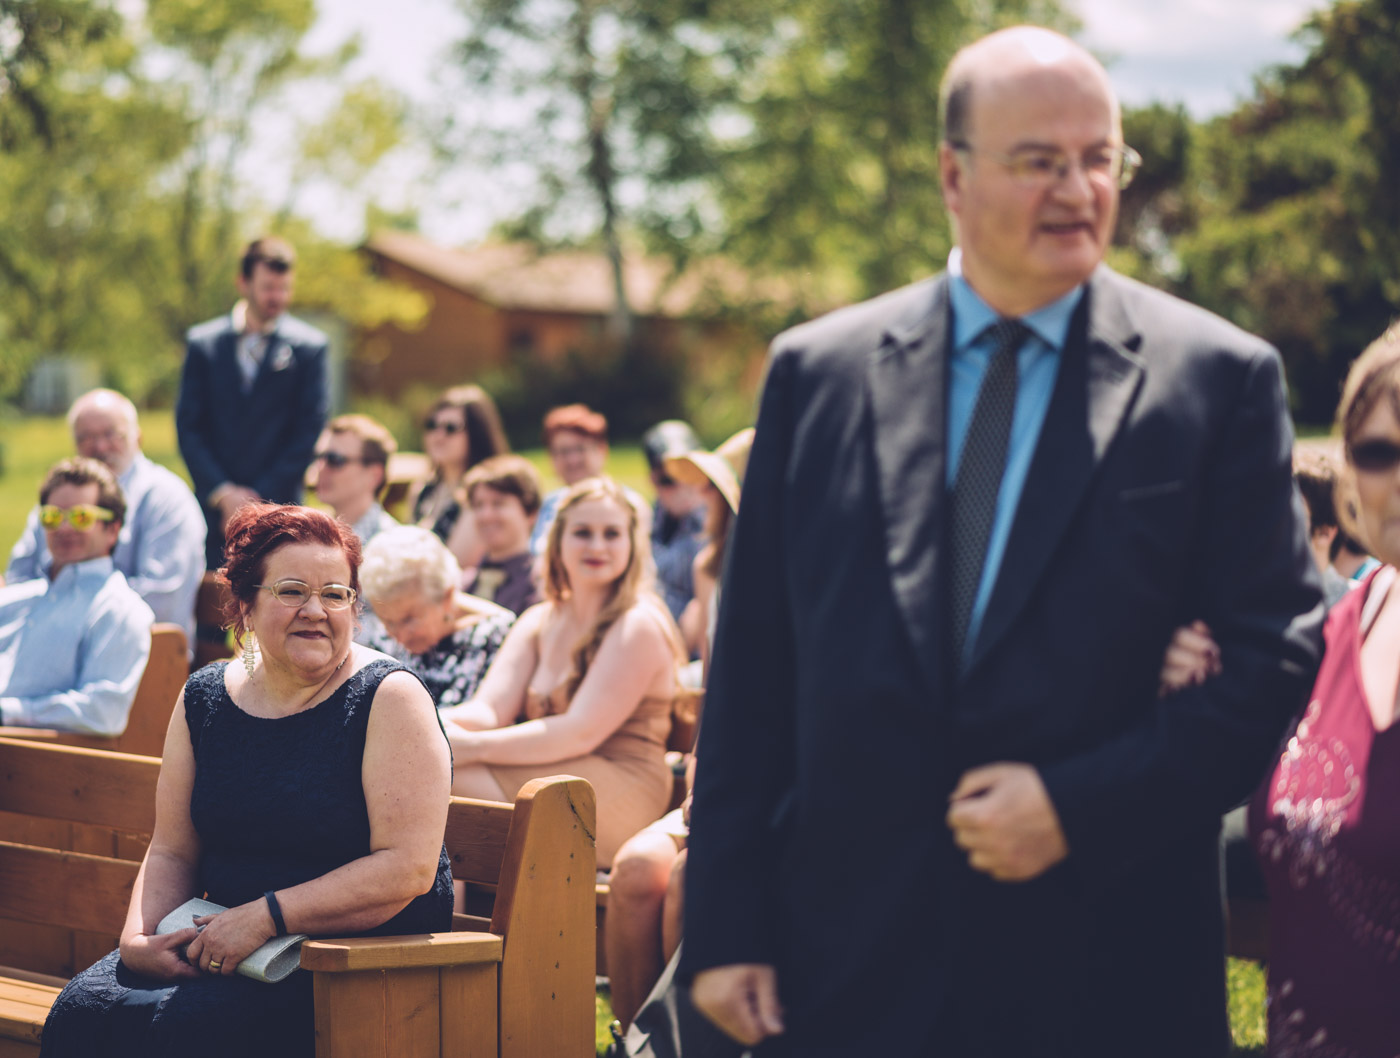 sarah_andrew_wedding_blog37.jpg